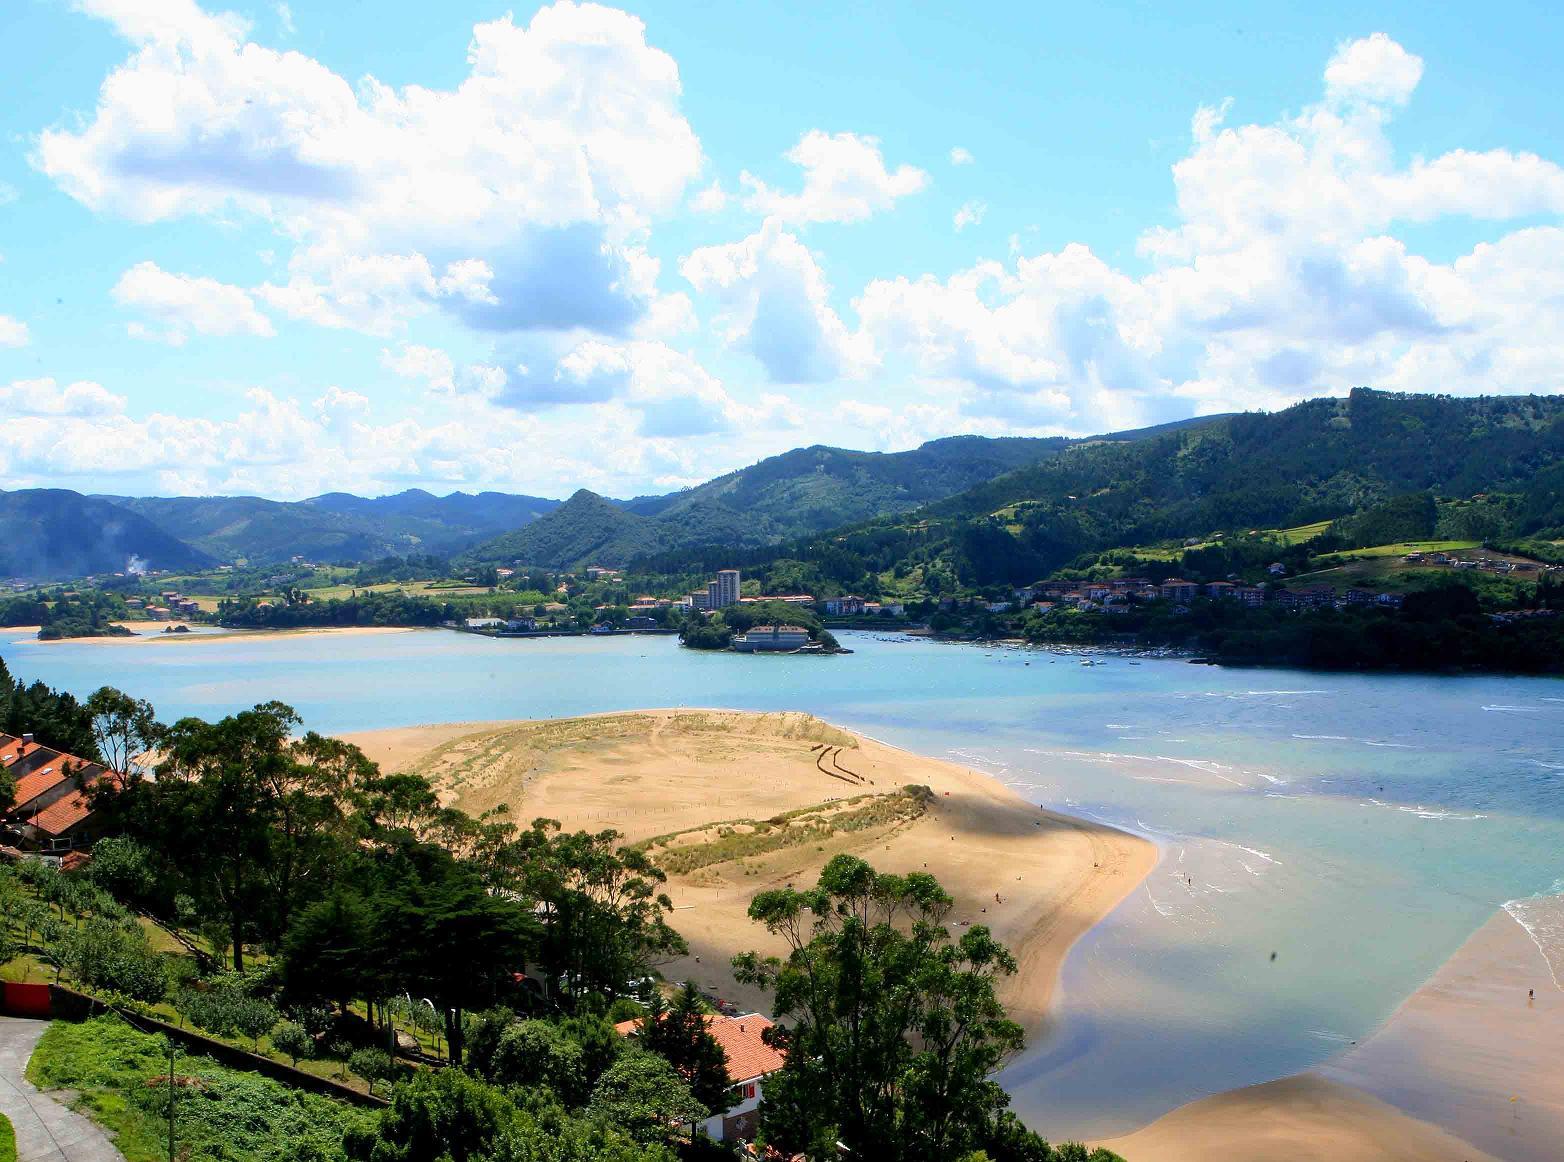 Playa de Laida. Mundaka. Archivo propiedad de Urremendi